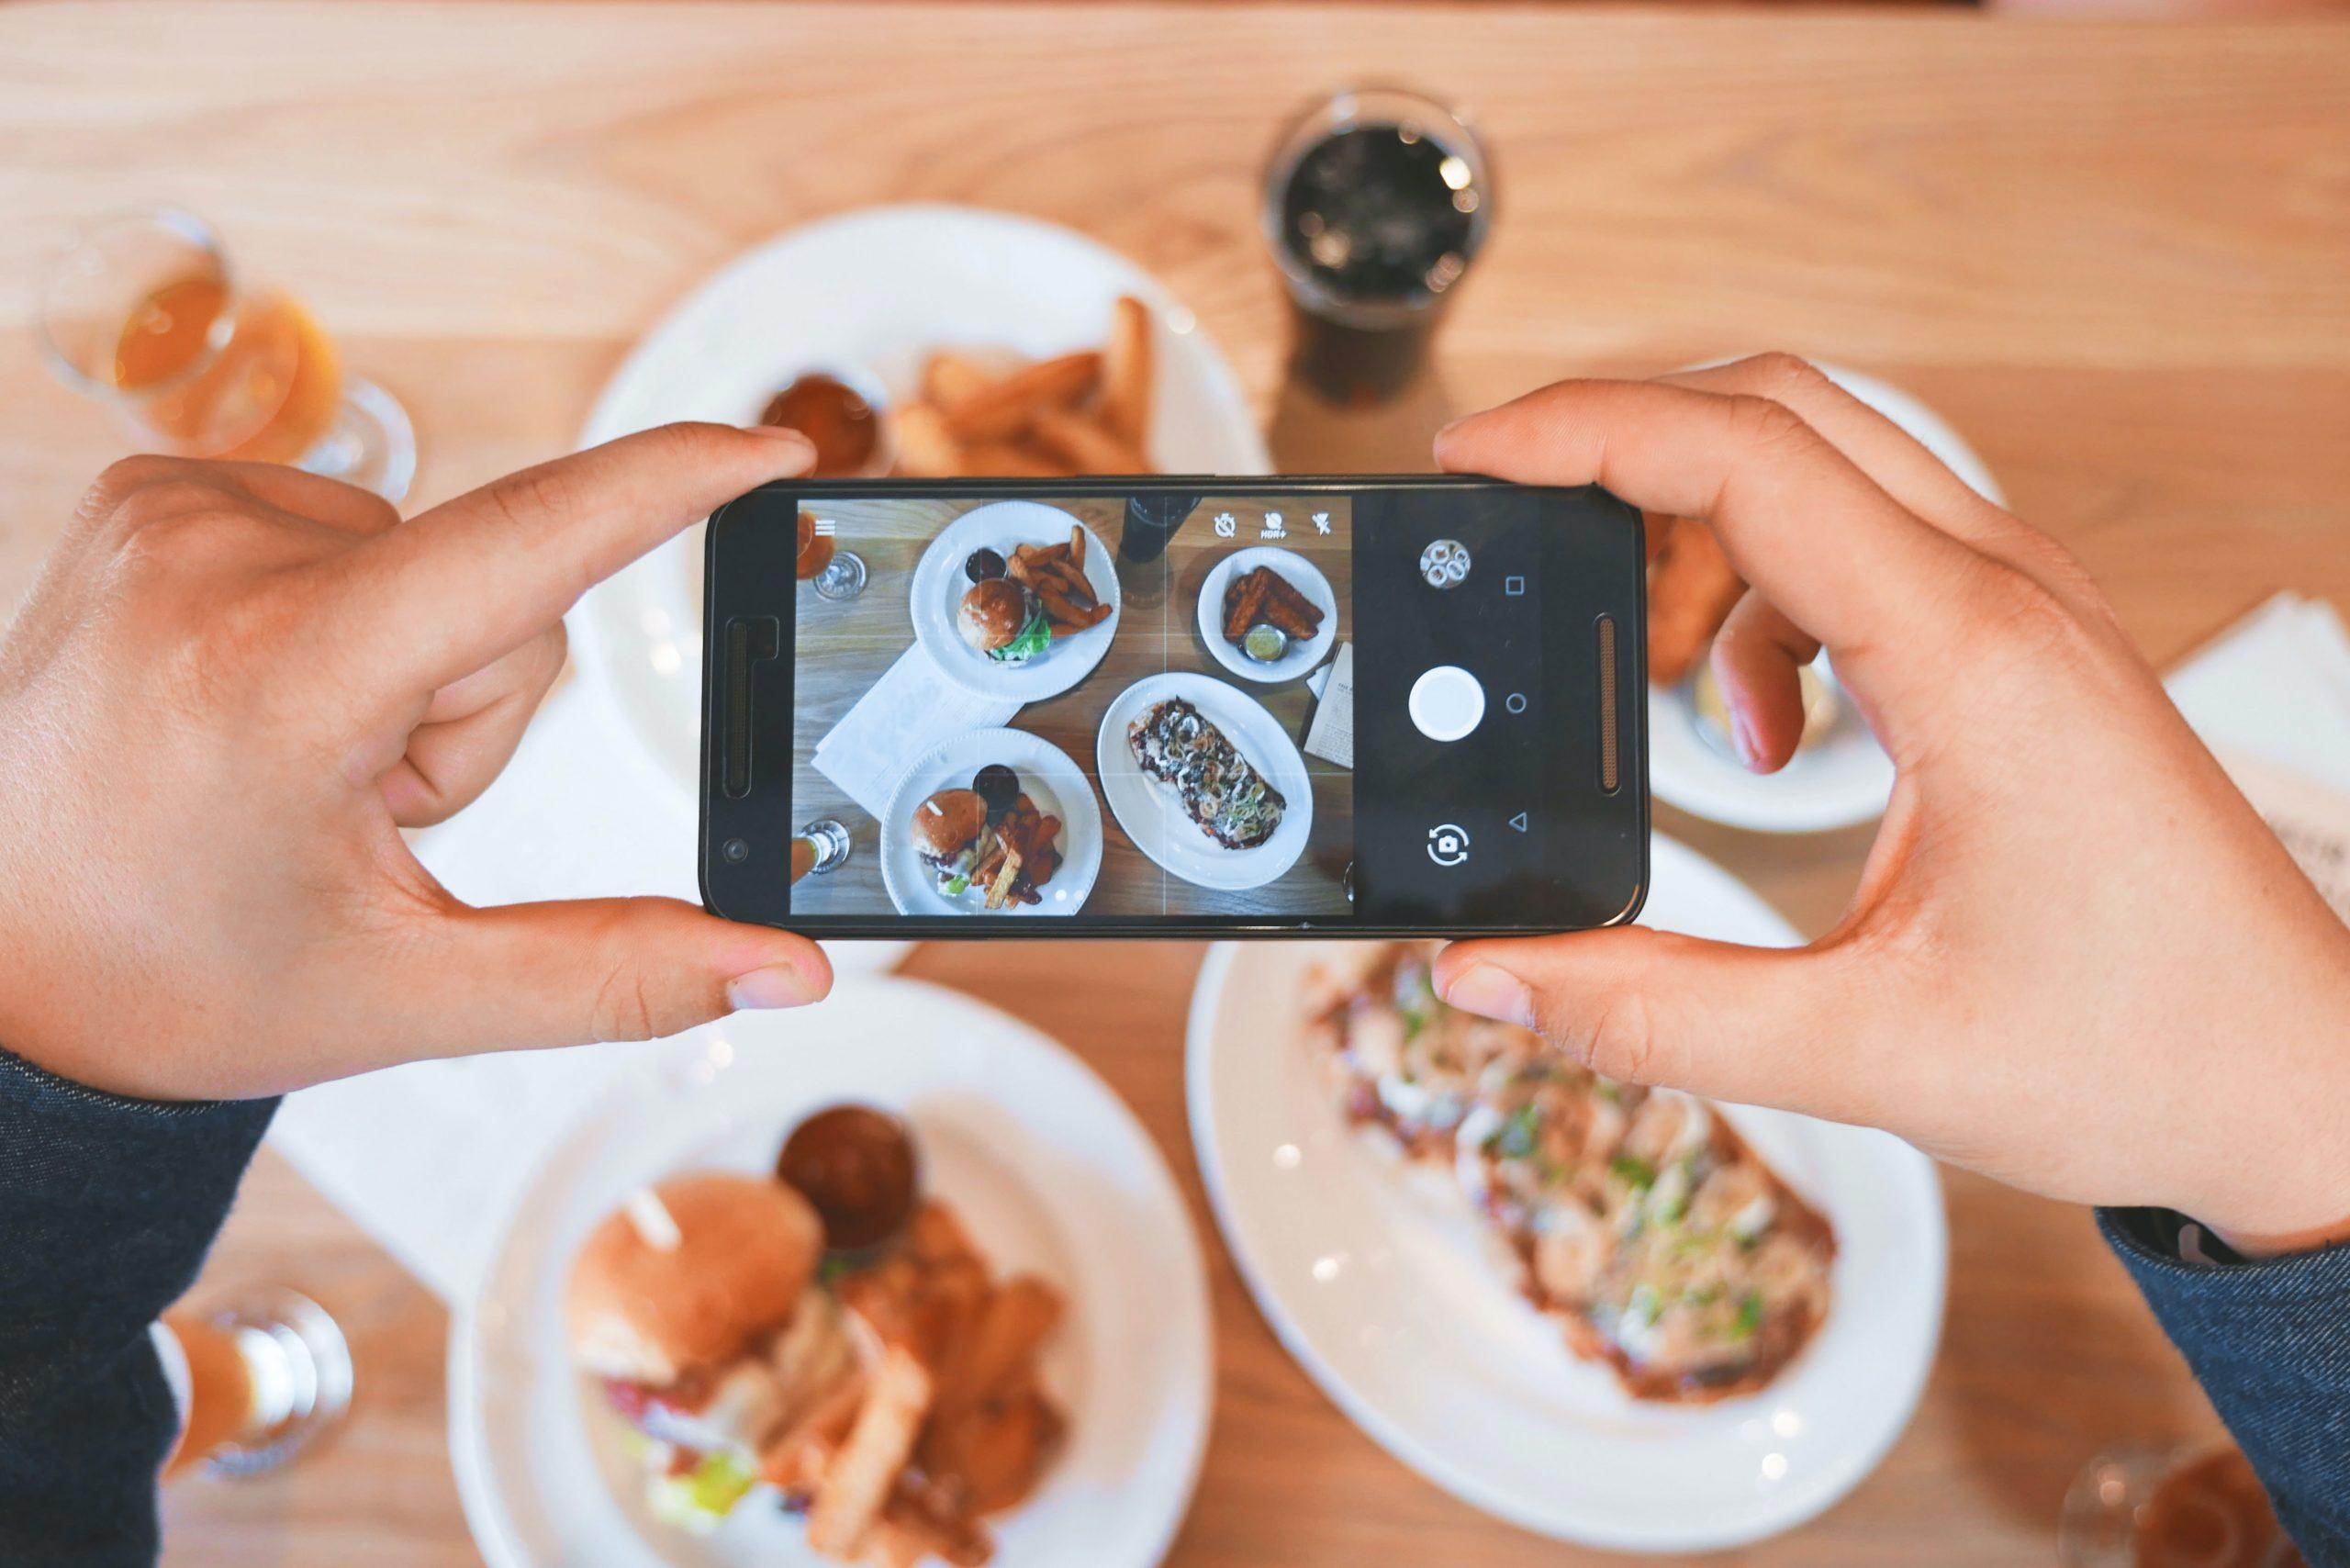 Cómo mejorar tu engagement en Instagram